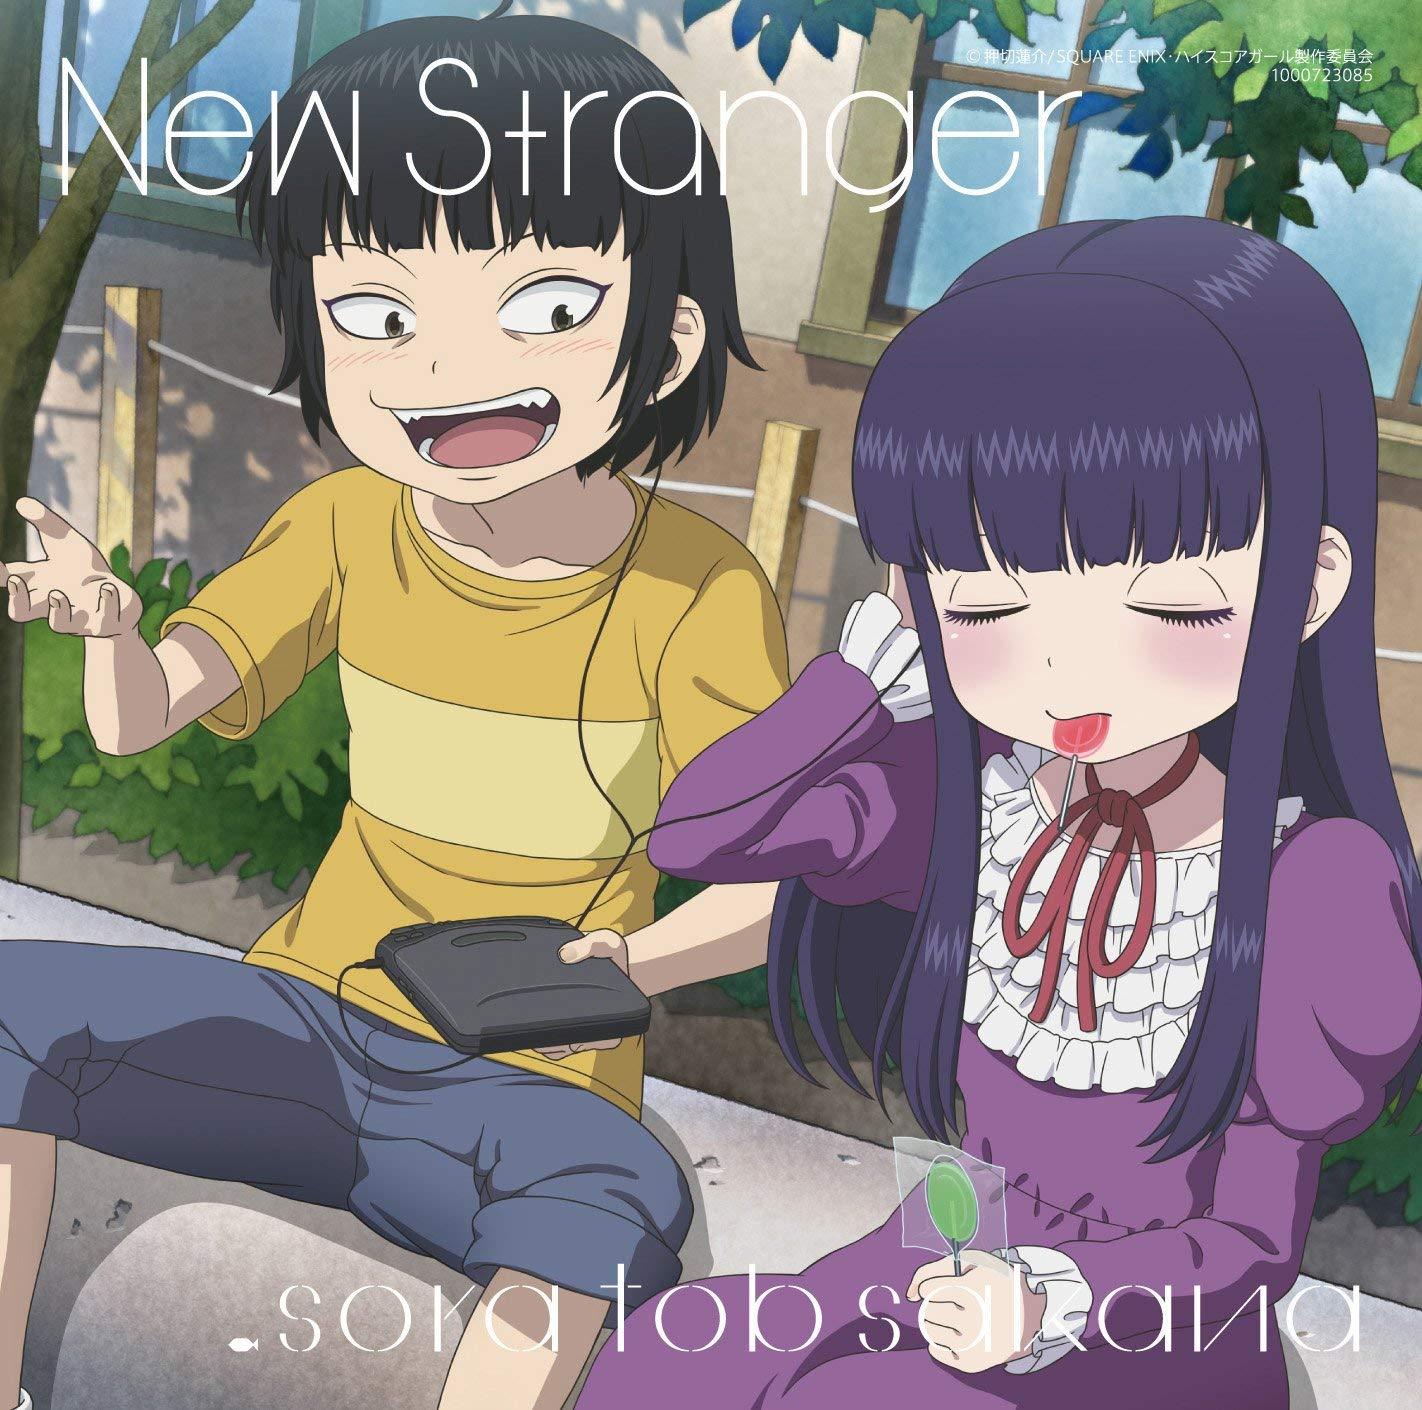 New Stranger by sora tob sakana [Nodeloid]